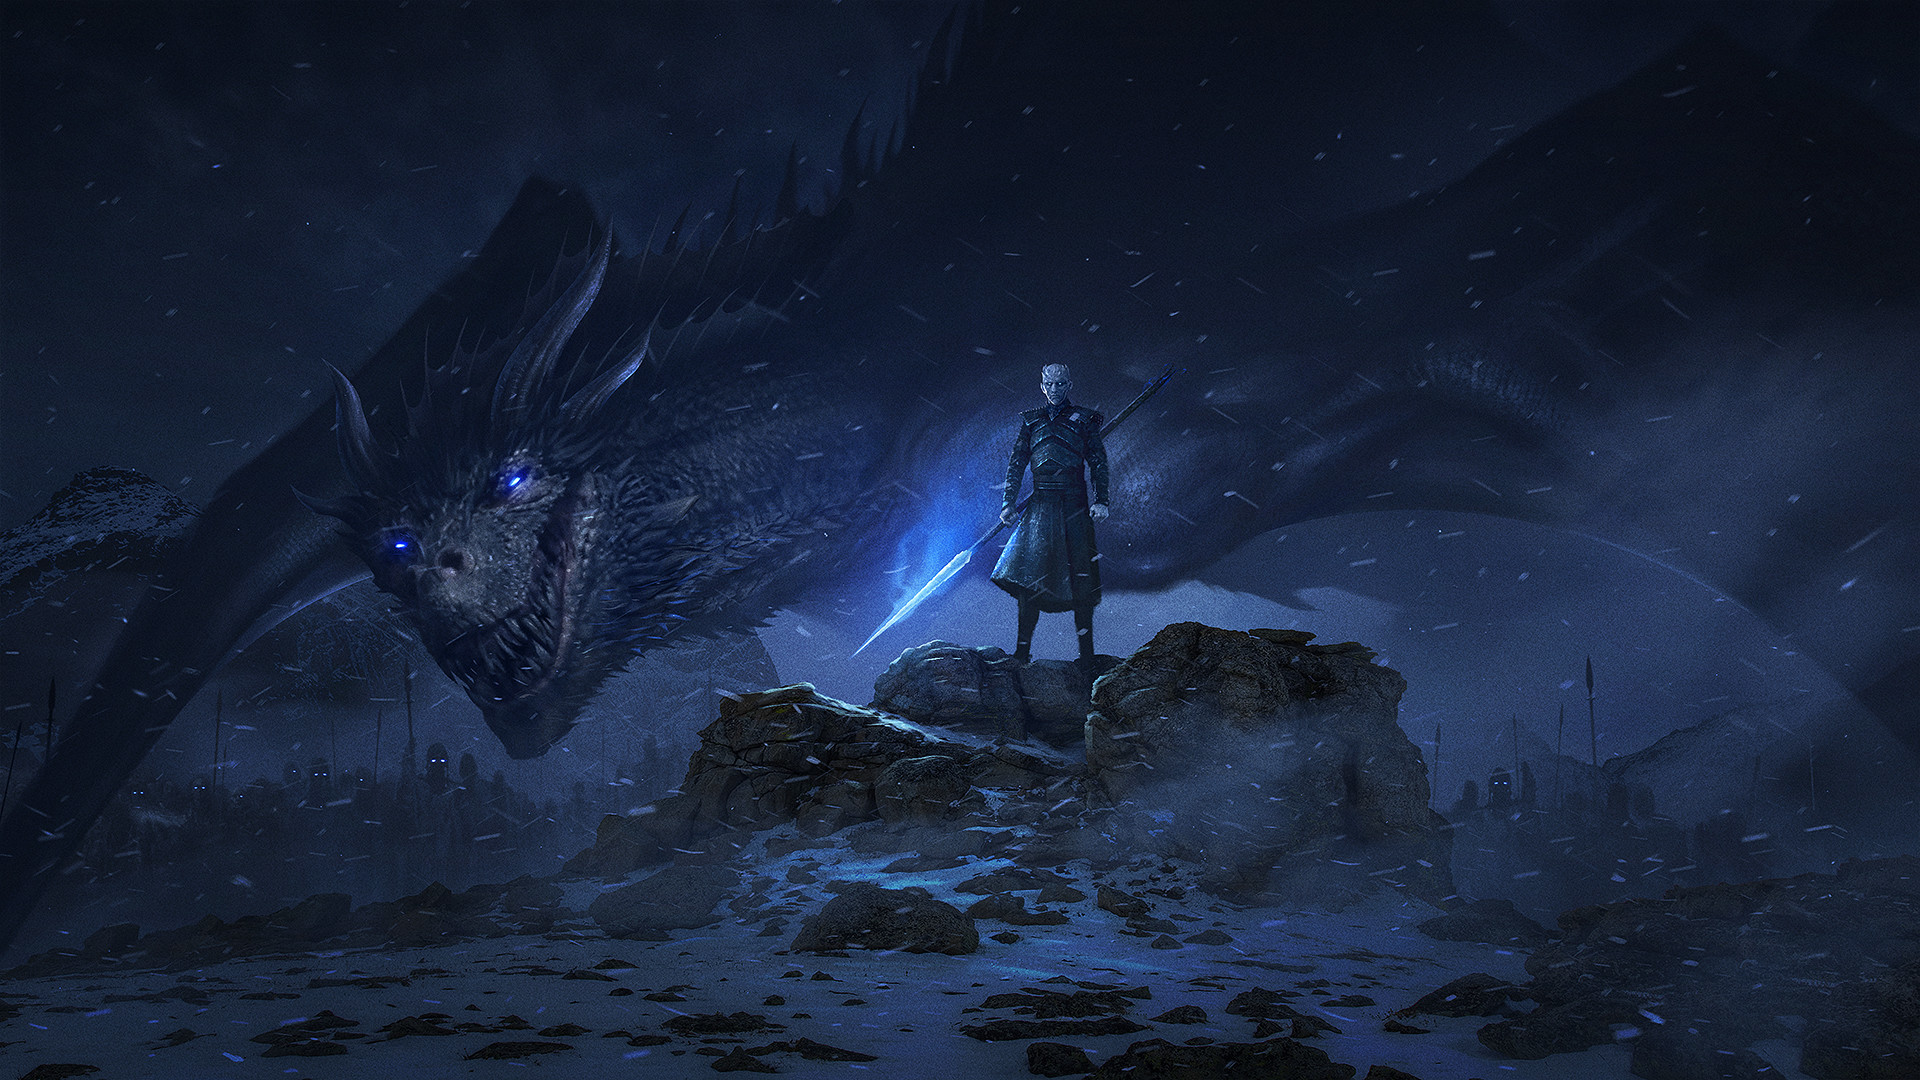 Game Of Thrones Season 7 Wallpapers ① Wallpapertag